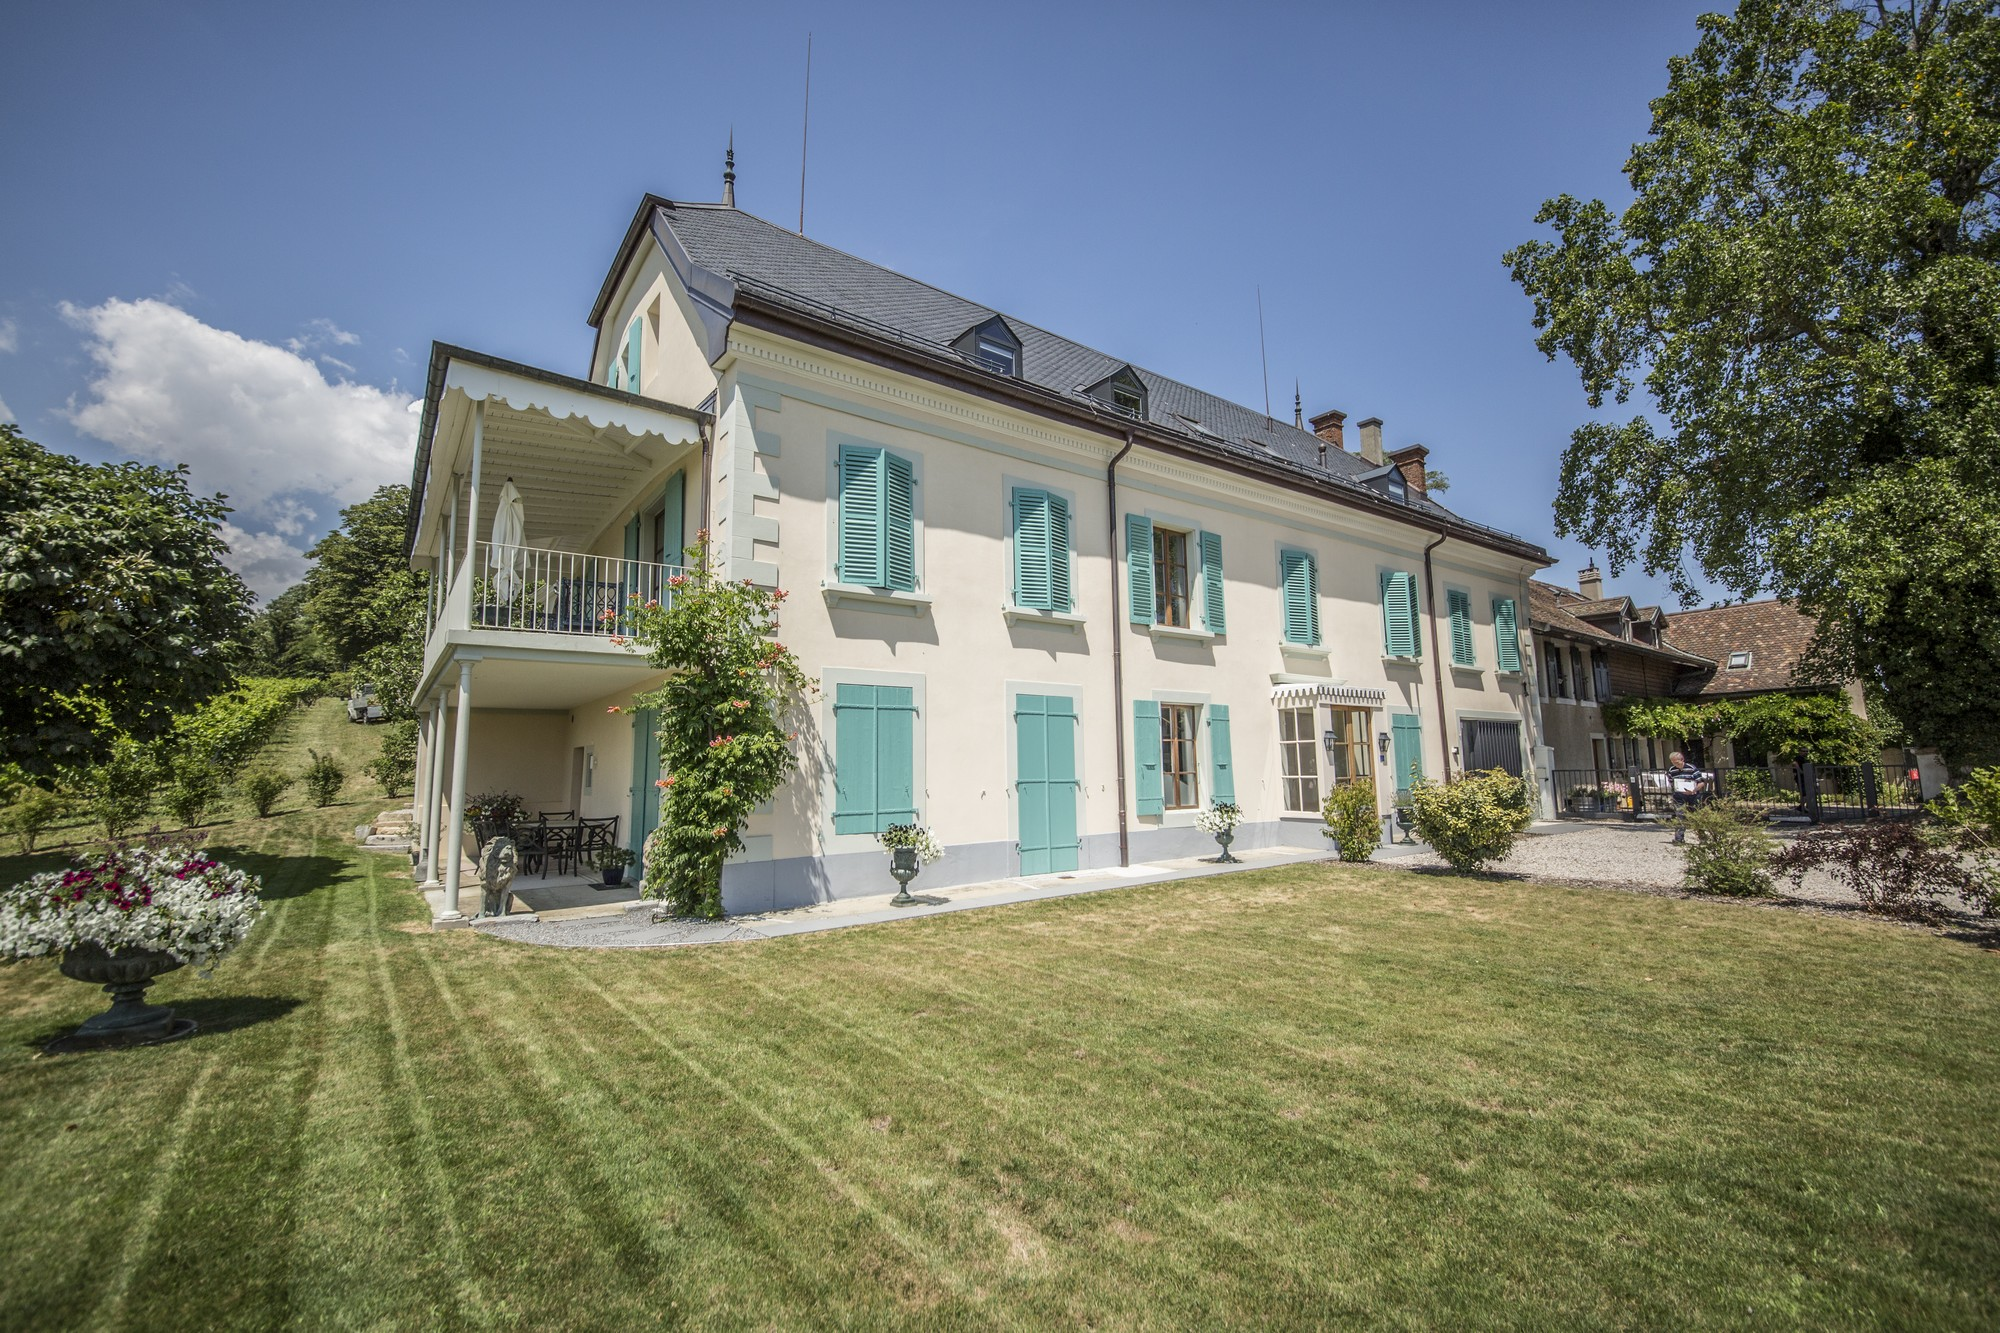 Multimedia Lausanne